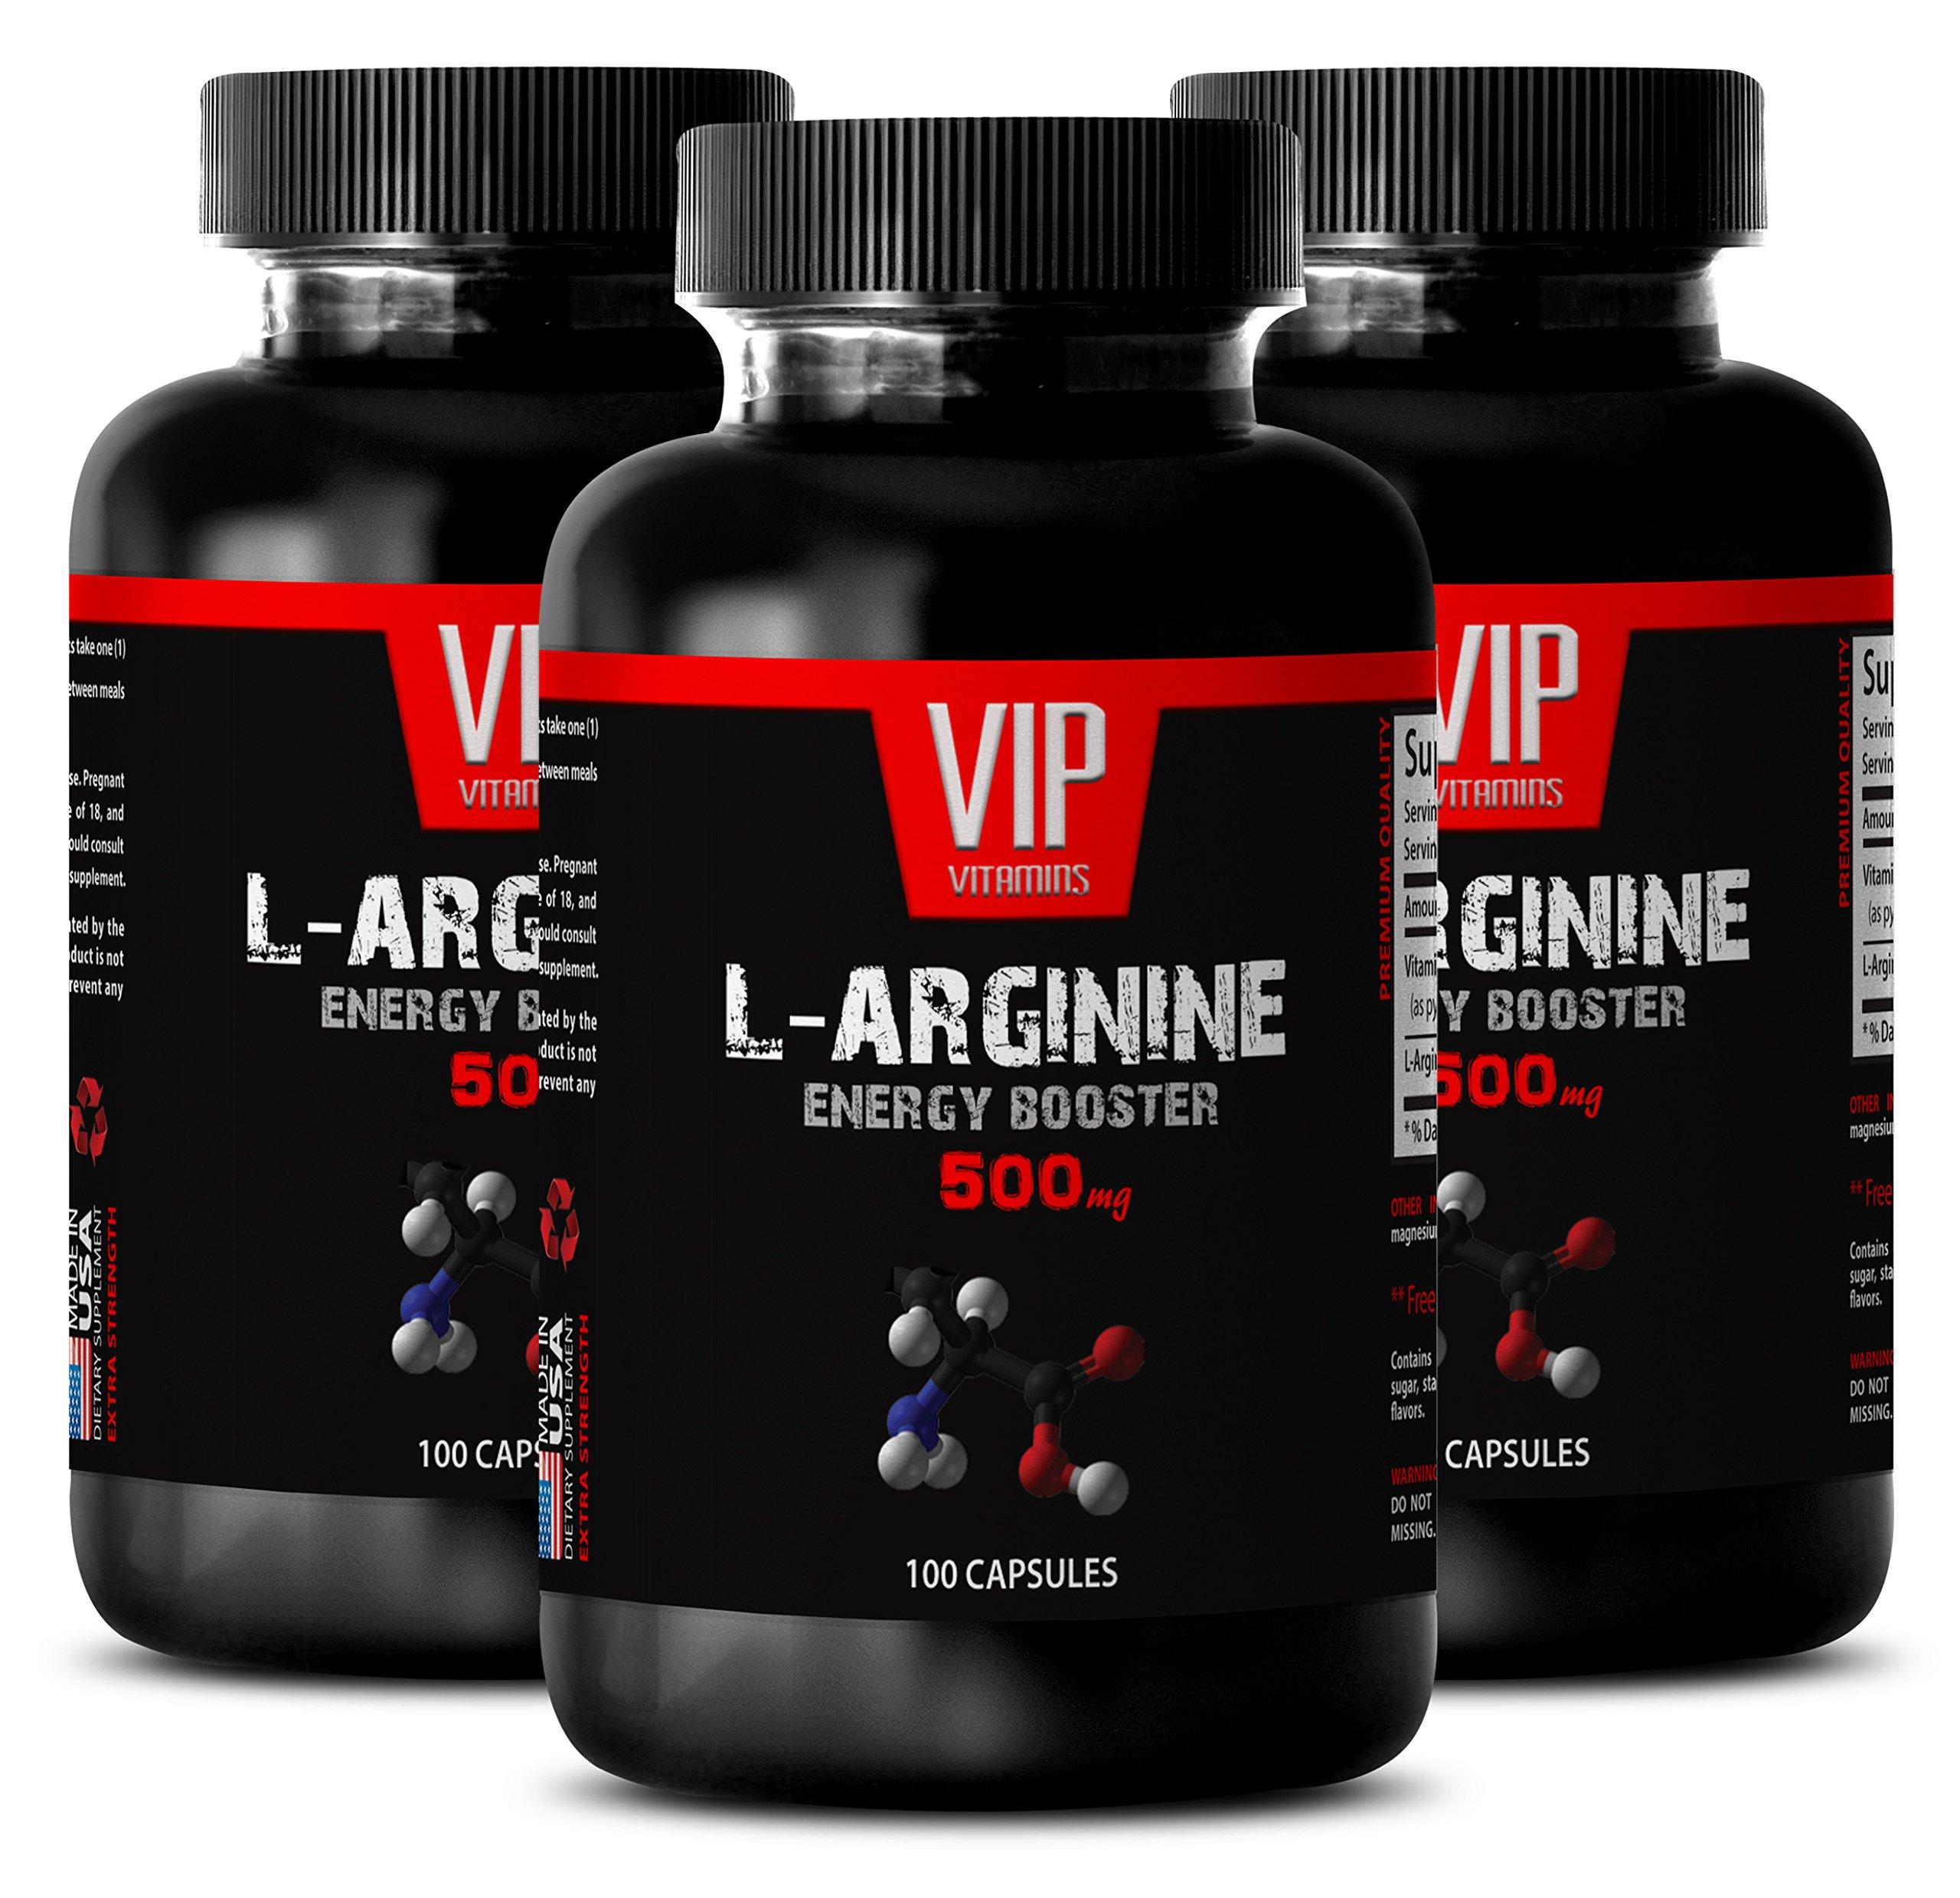 Arginine men - L-ARGININE Energy Booster 500 mg - Fitness supplements - 3 Bottles 300 Capsules